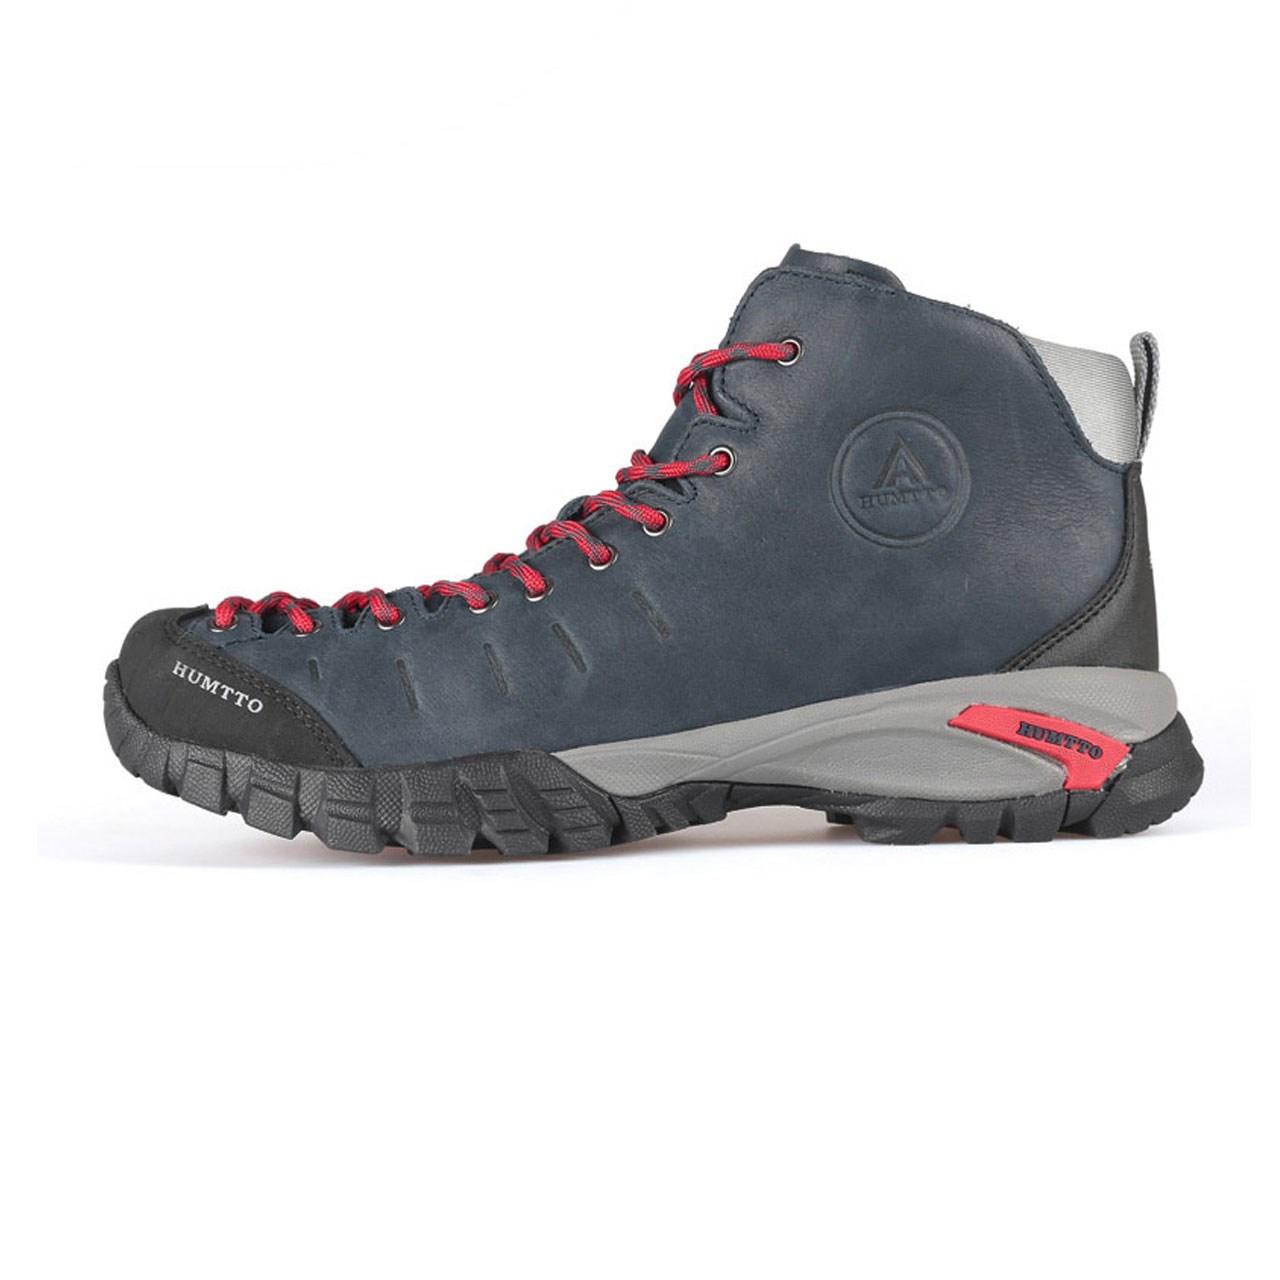 قیمت کفش کوهنوردی هامتو مدل 3-6907